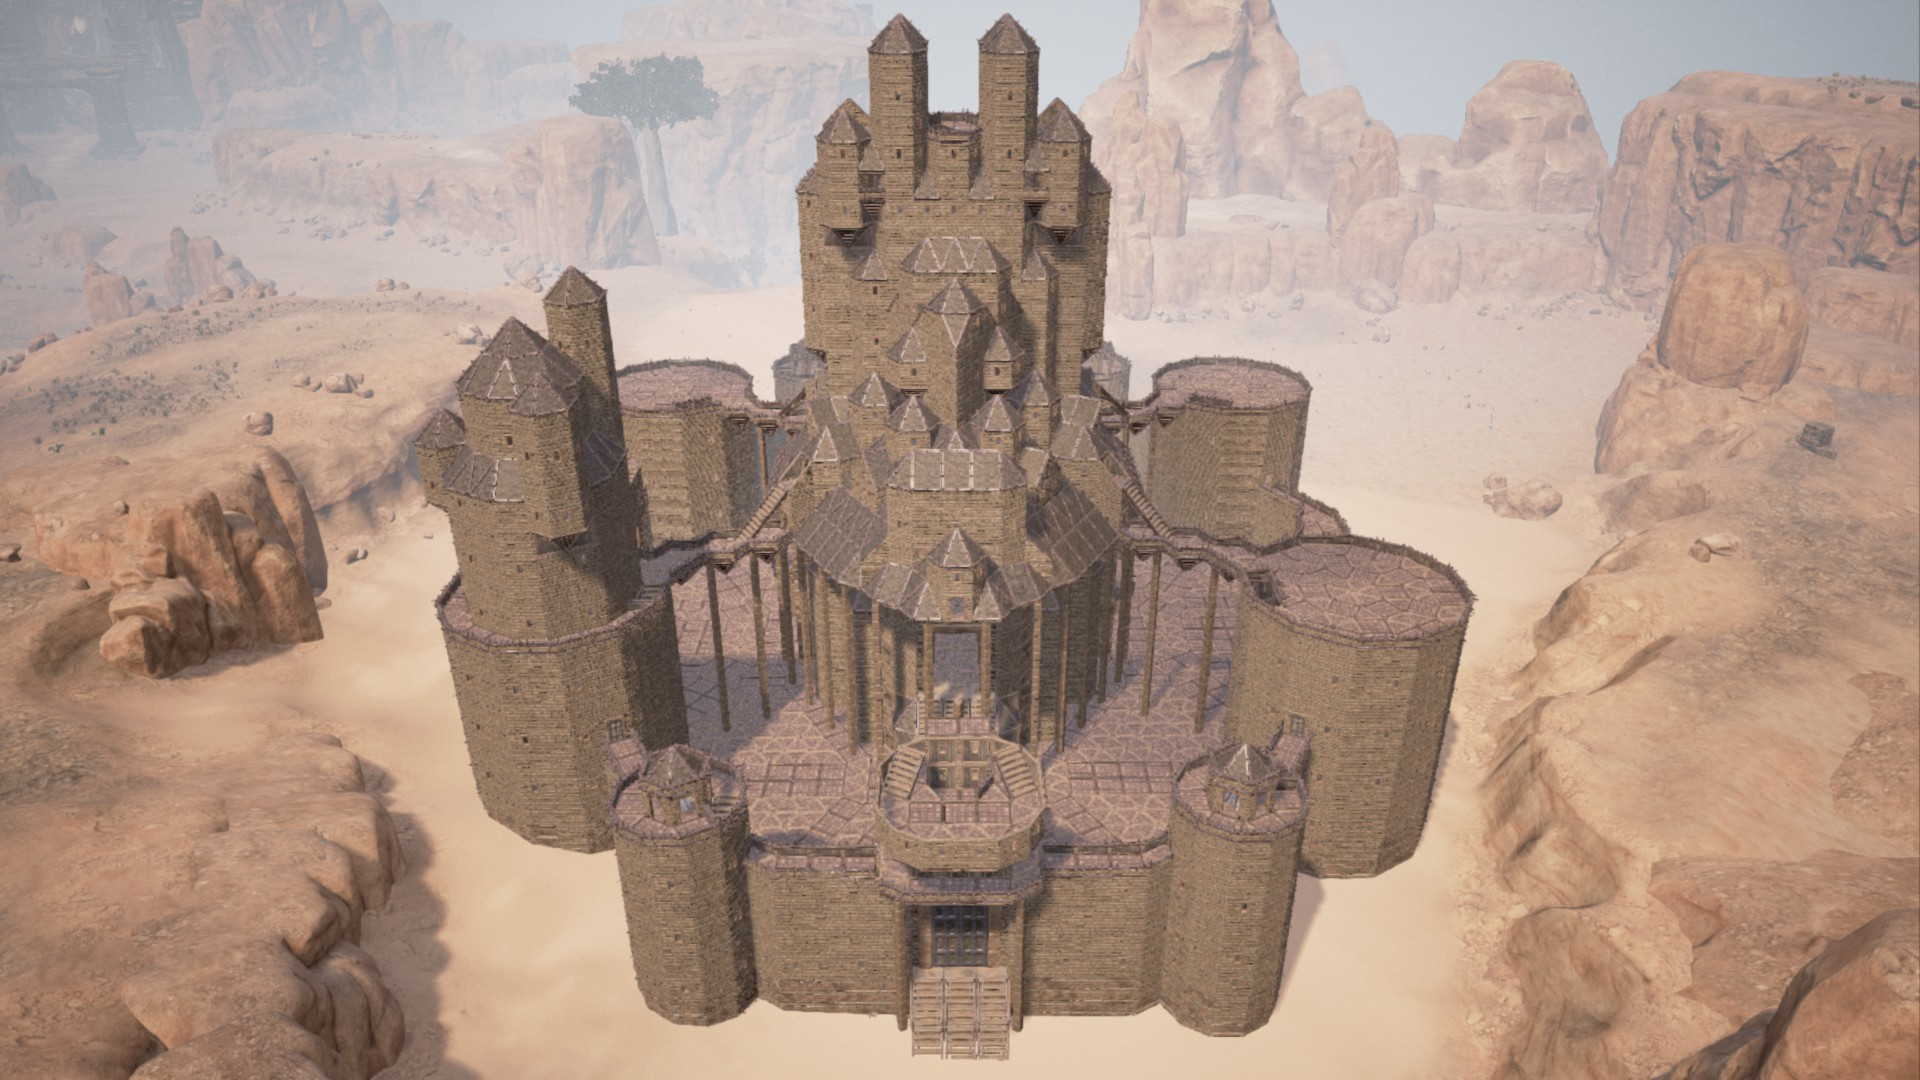 【Conan Exiles】攻めにくい防衛拠点・大型拠点の建築簡単ガイド 基盤や屋根・壁など(コナンアウトキャスト)